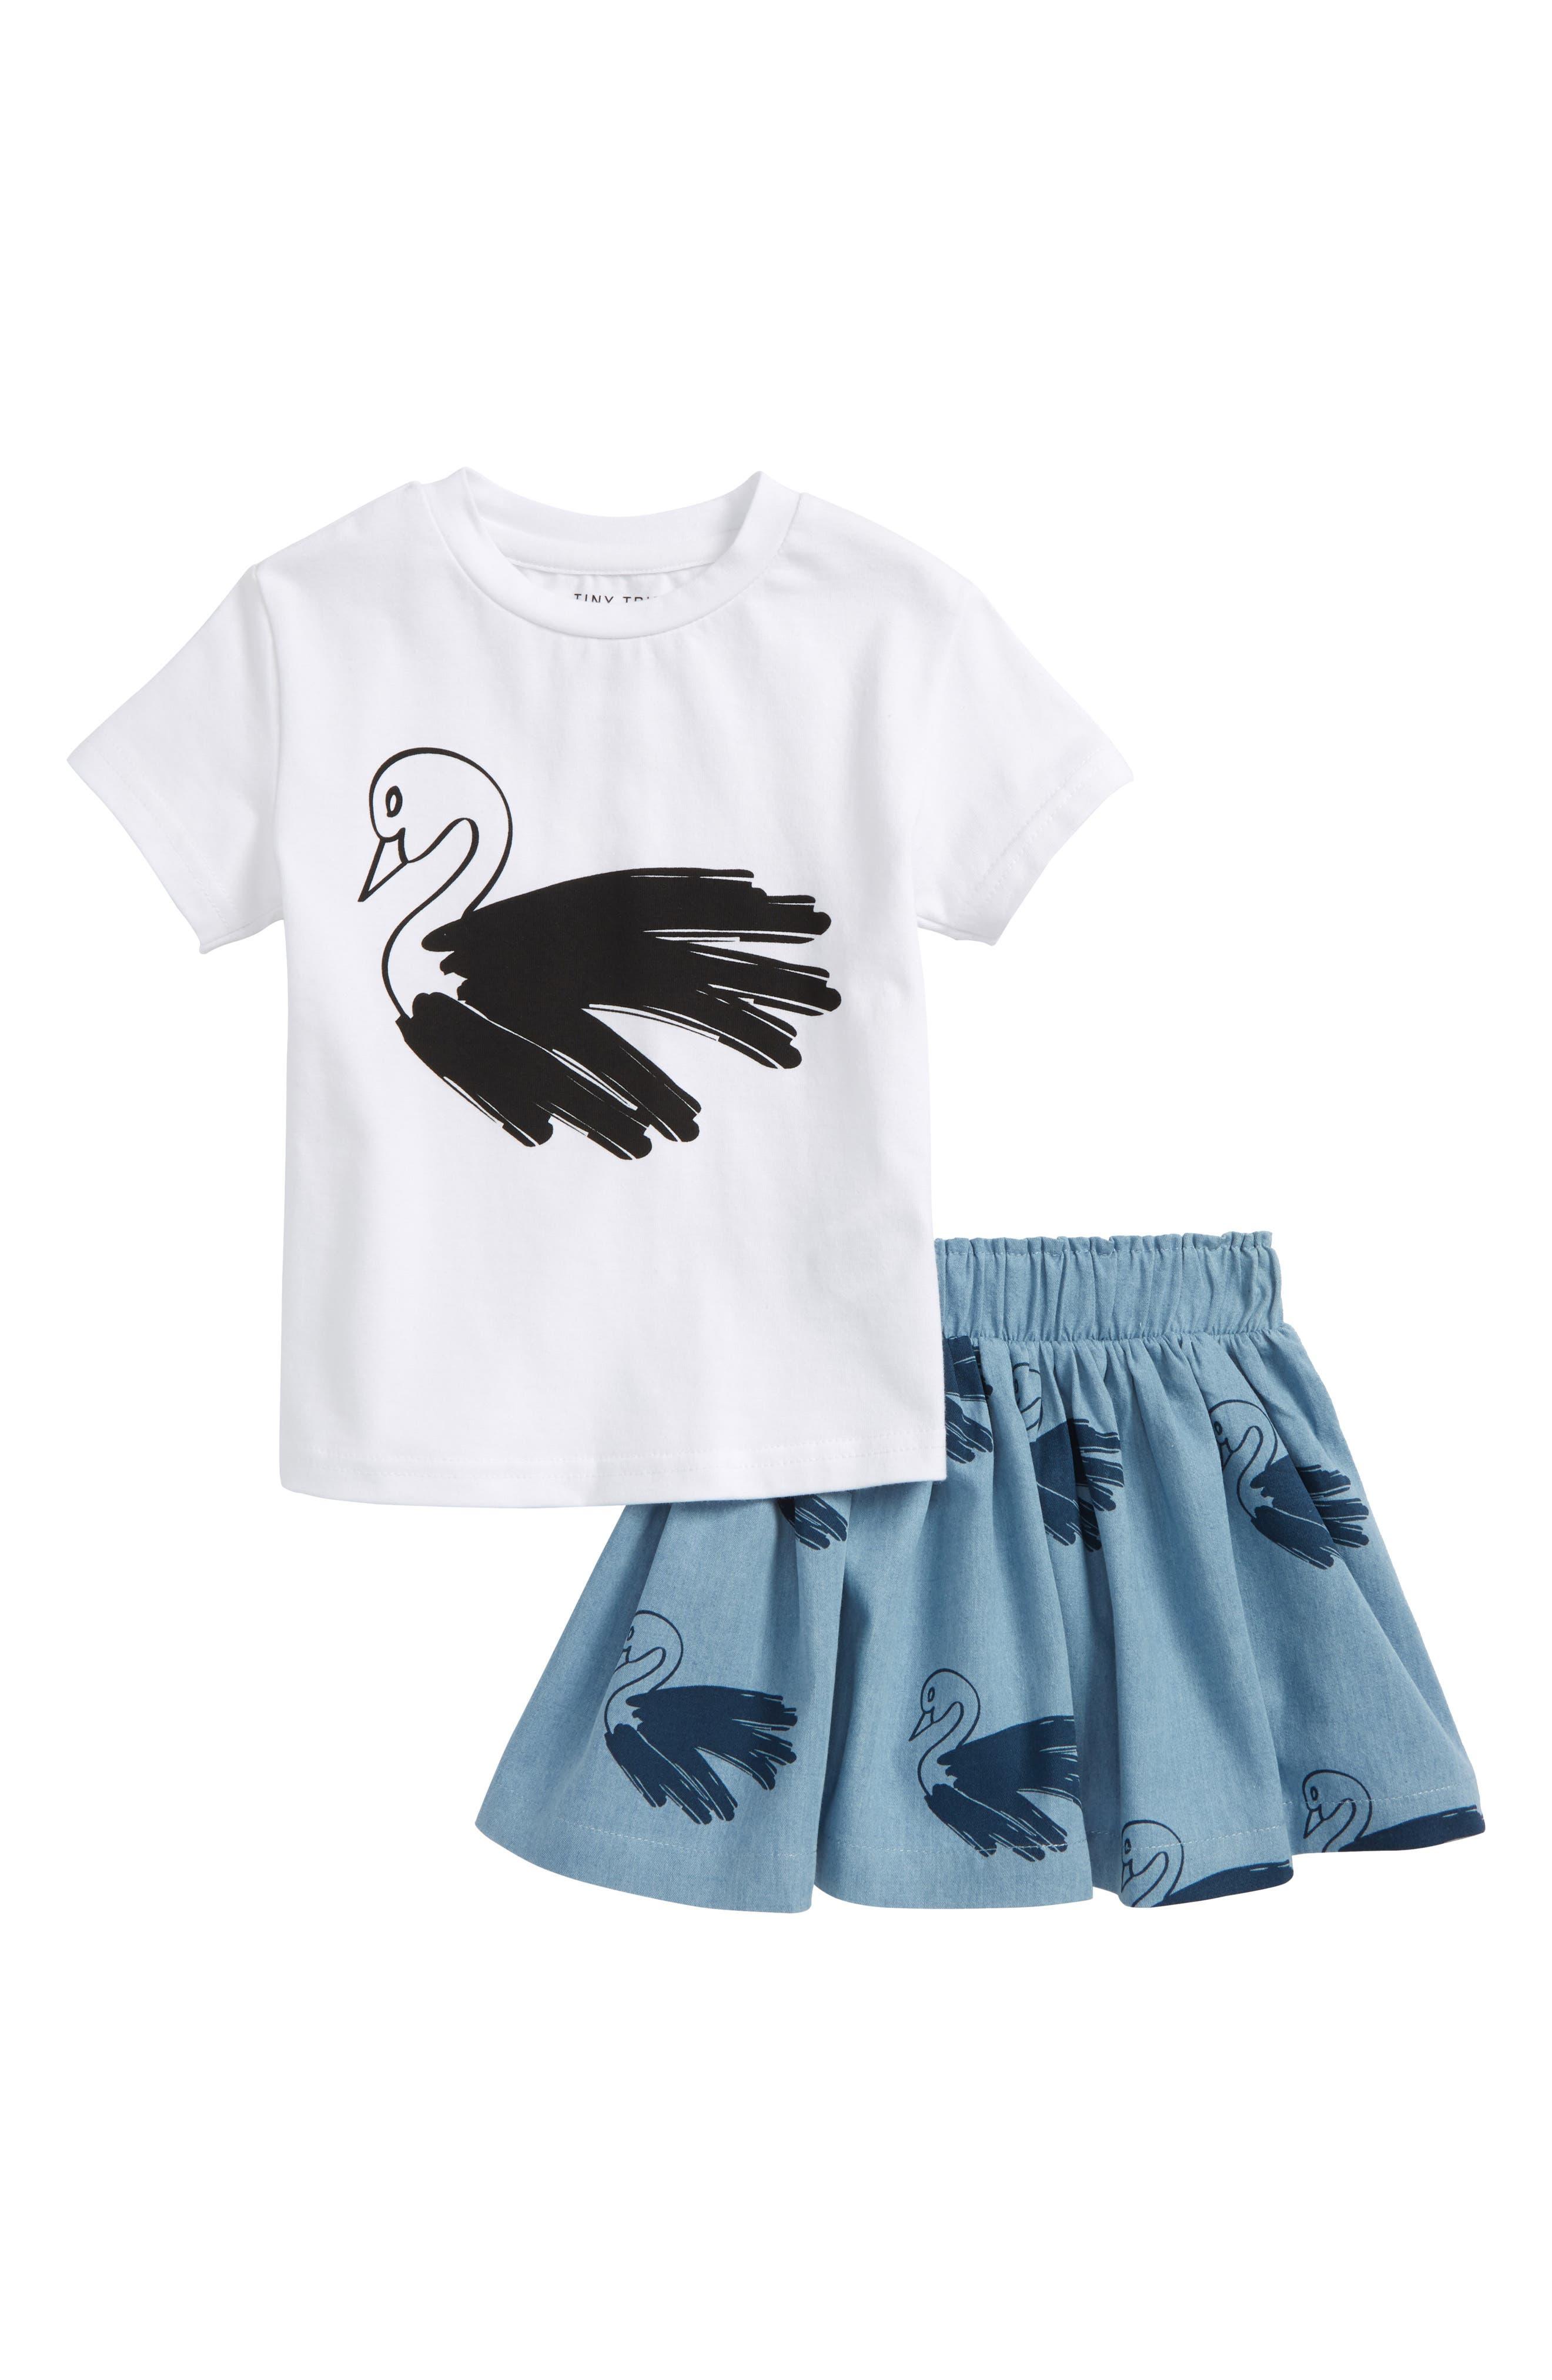 Swan Tee & Skort Set,                         Main,                         color, White/ Chambray